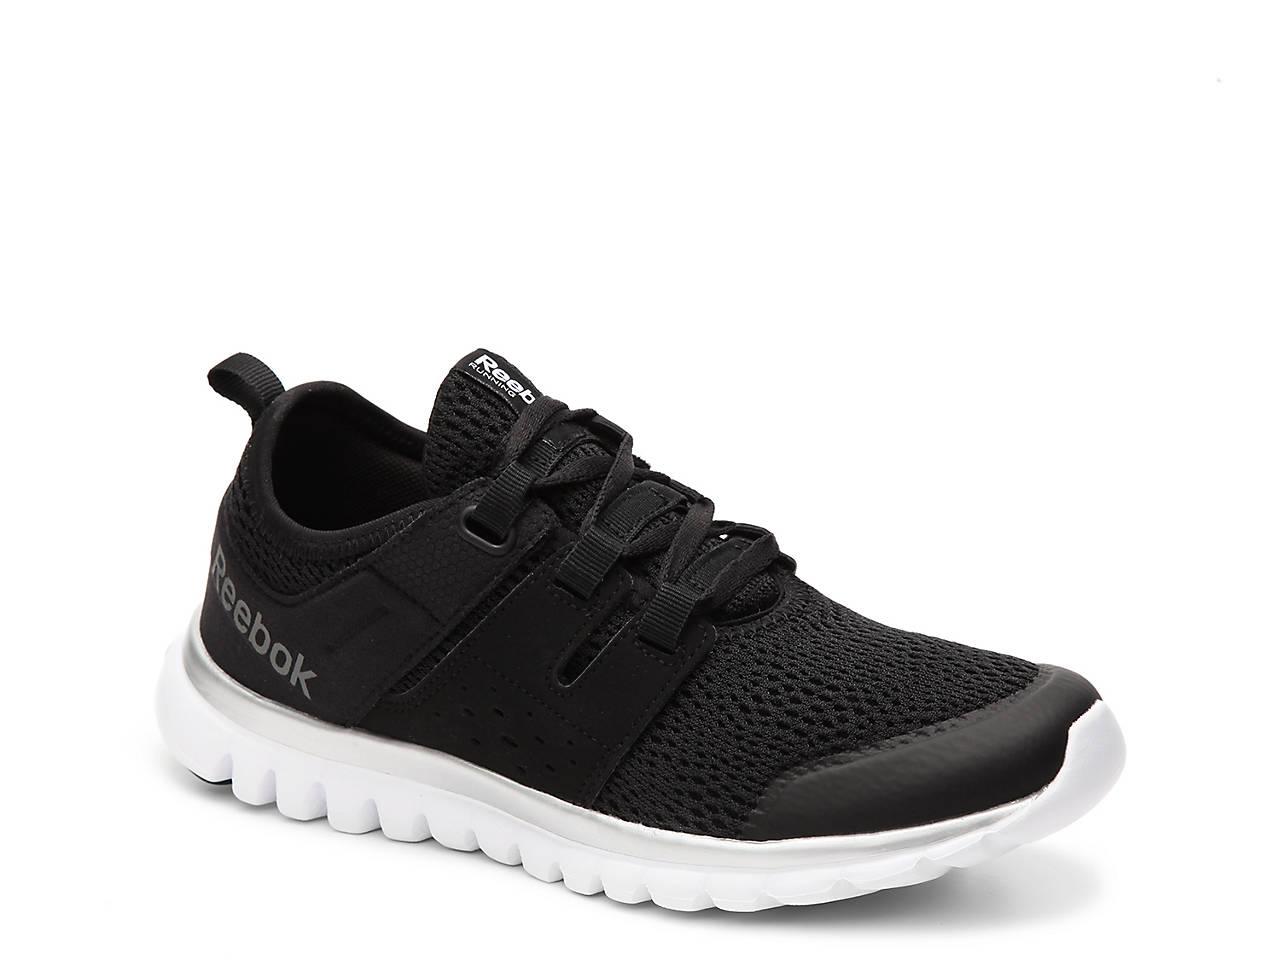 Sublite Authentic 2 Lightweight Running Shoe - Women's